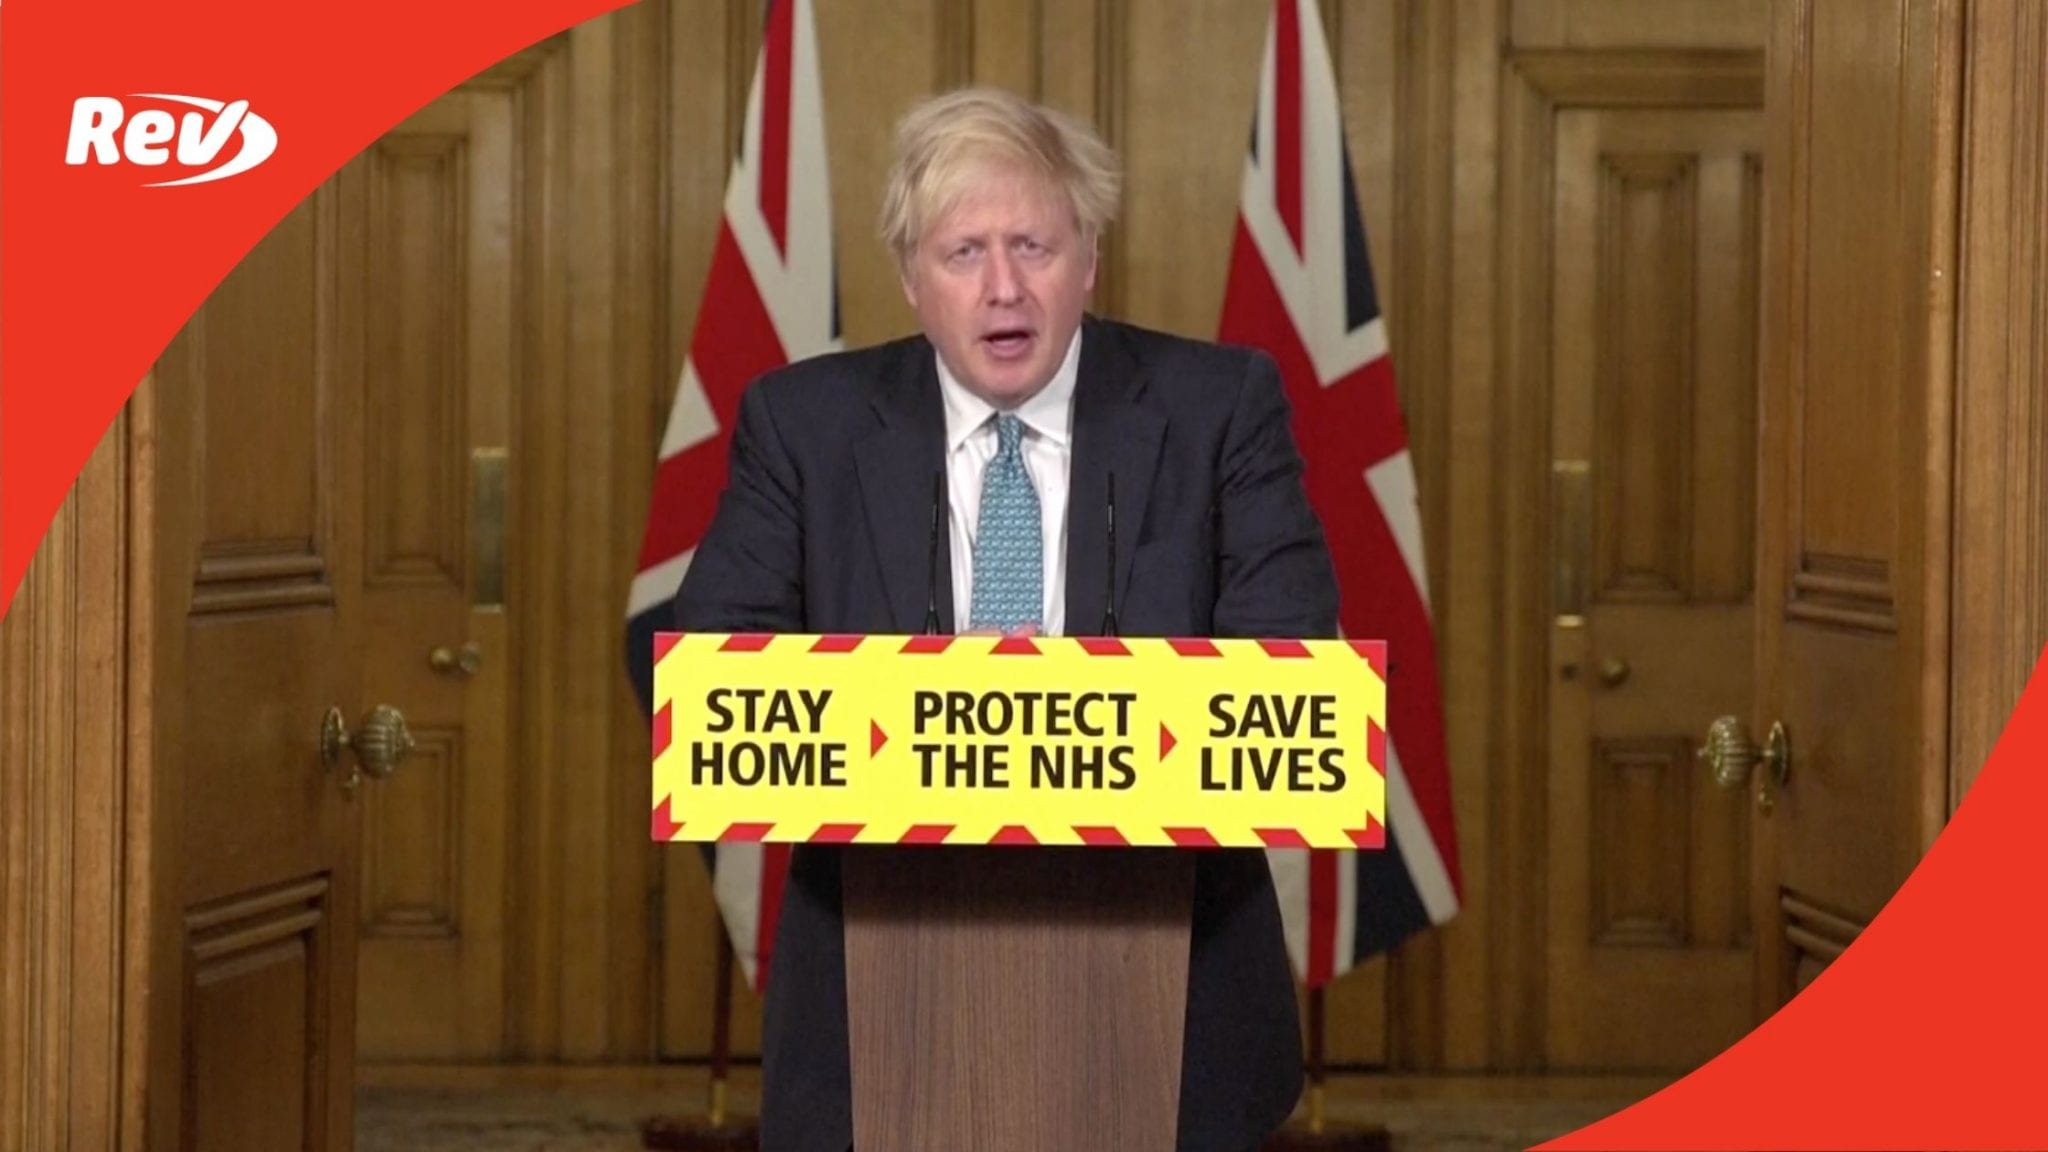 Boris Johnson COVID-19 Press Conference Transcript January 5